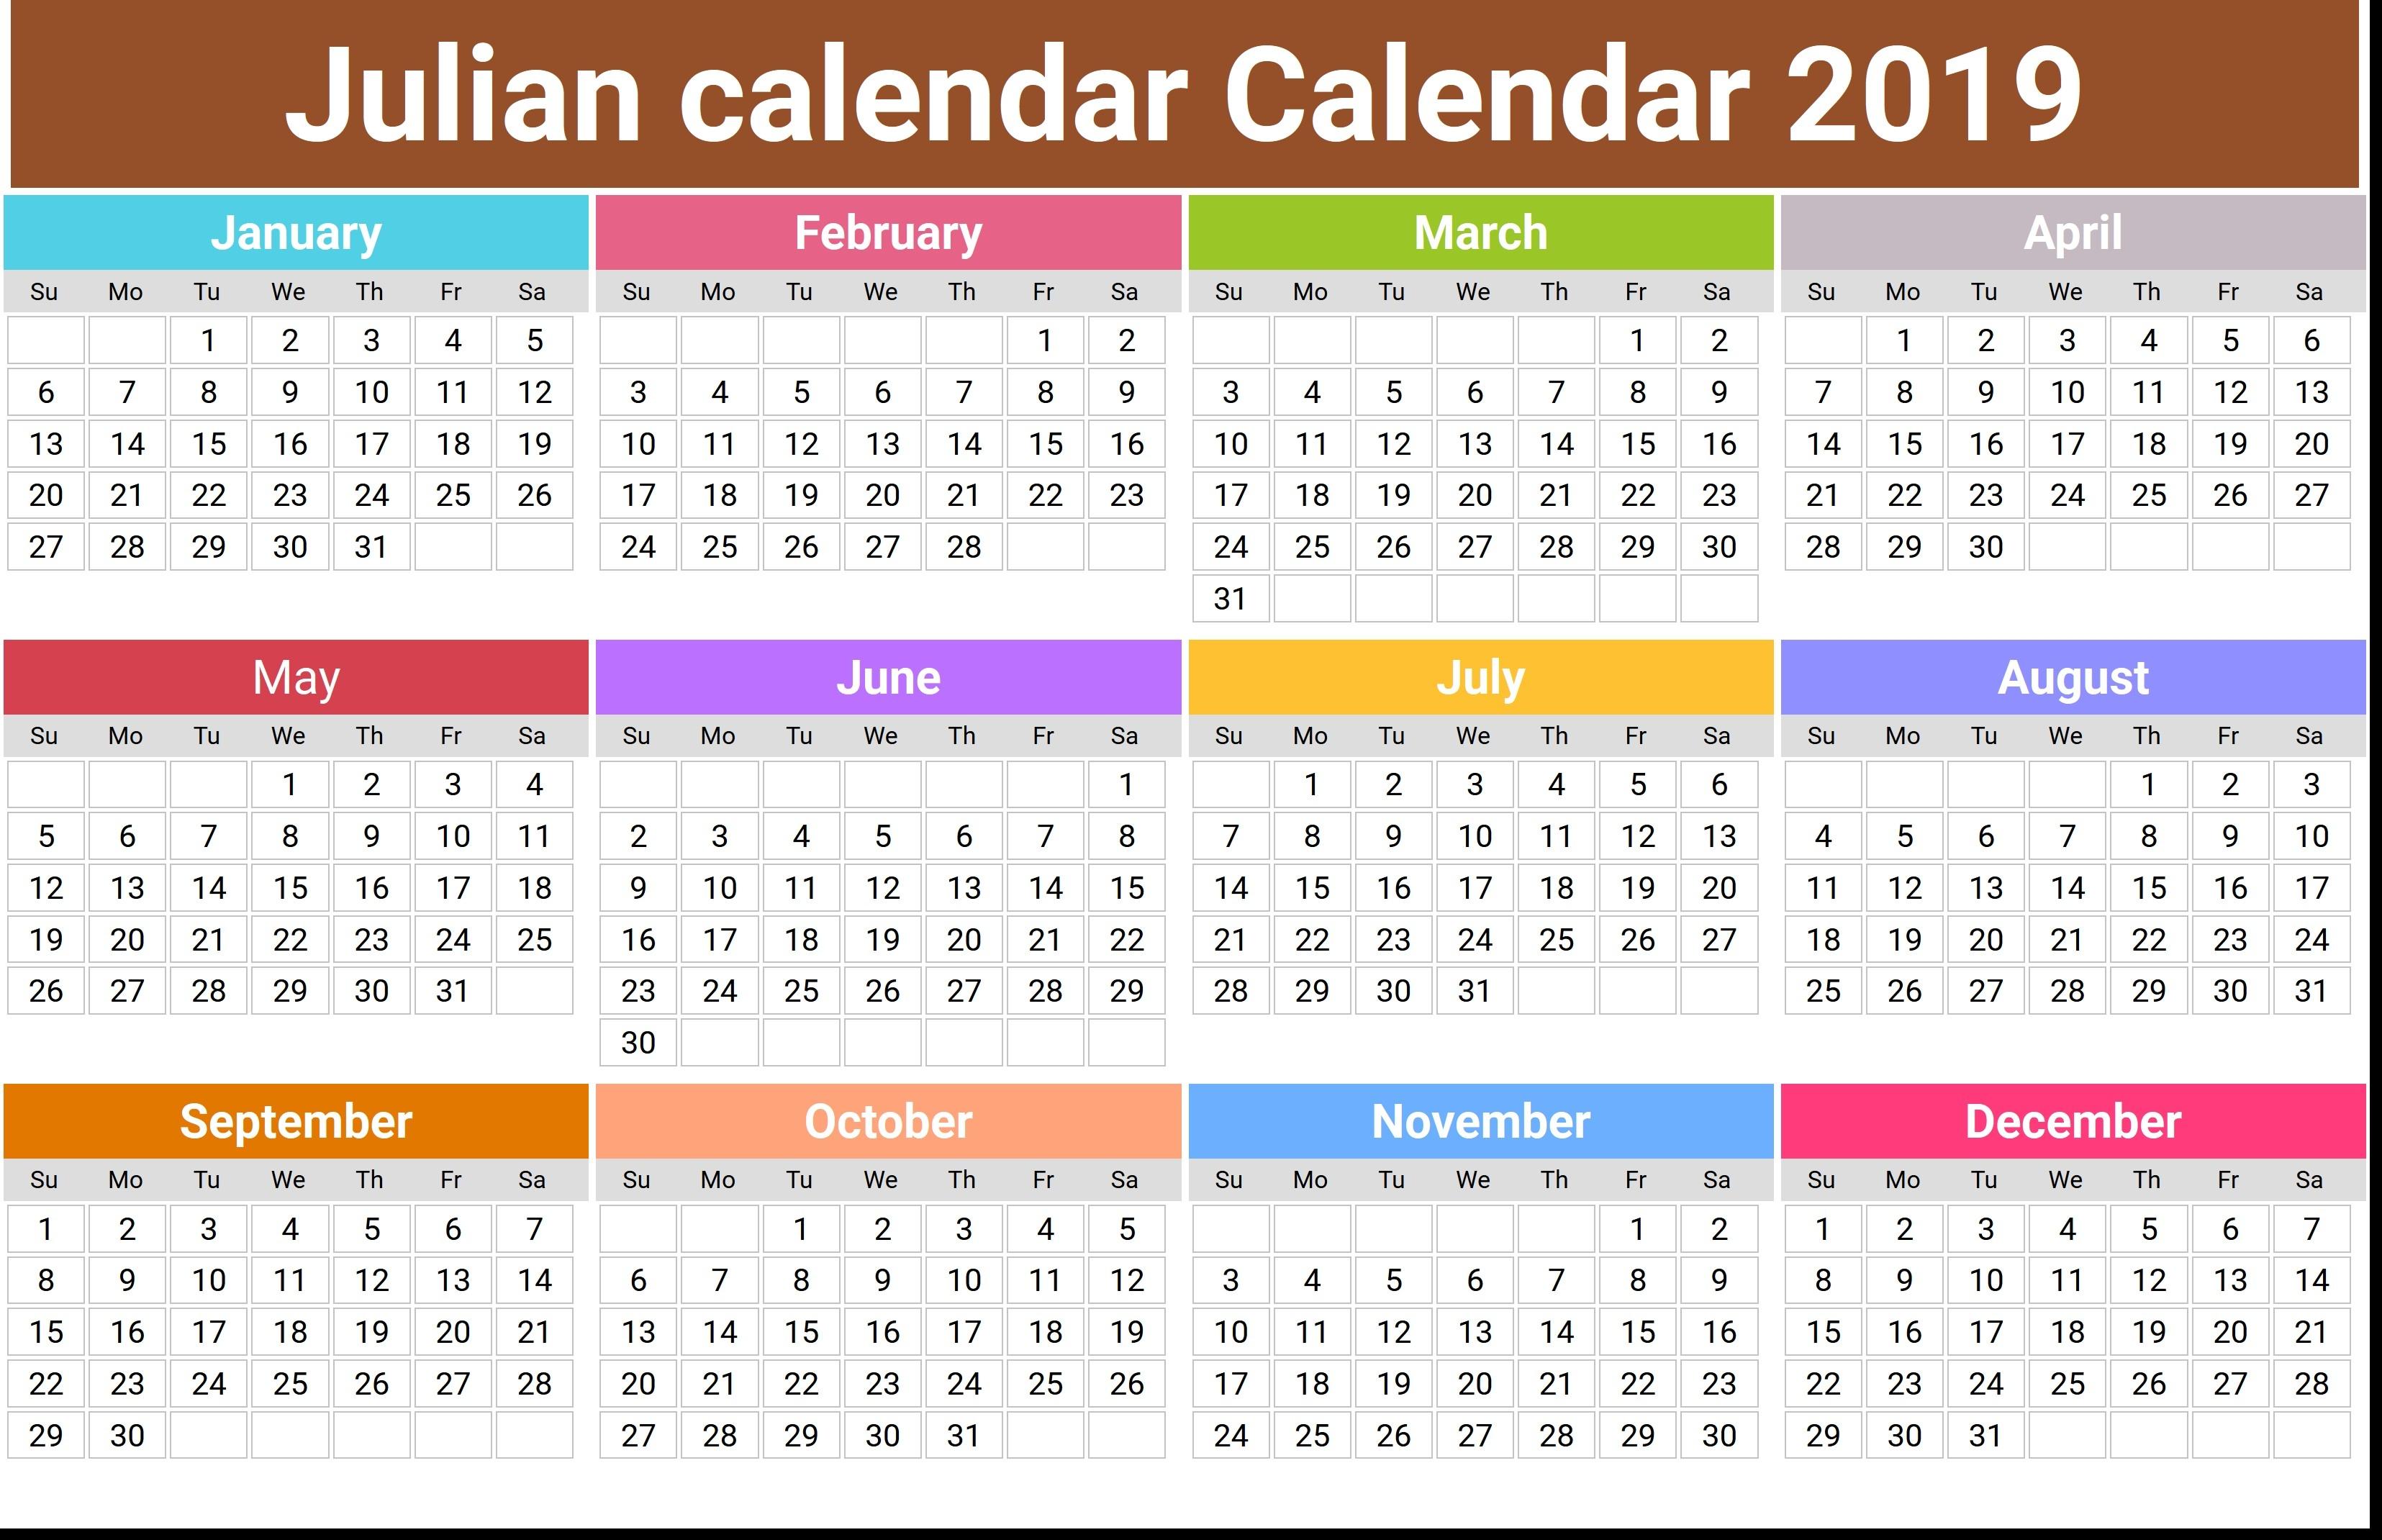 Printable Julian Calendar 2019 | Qualads